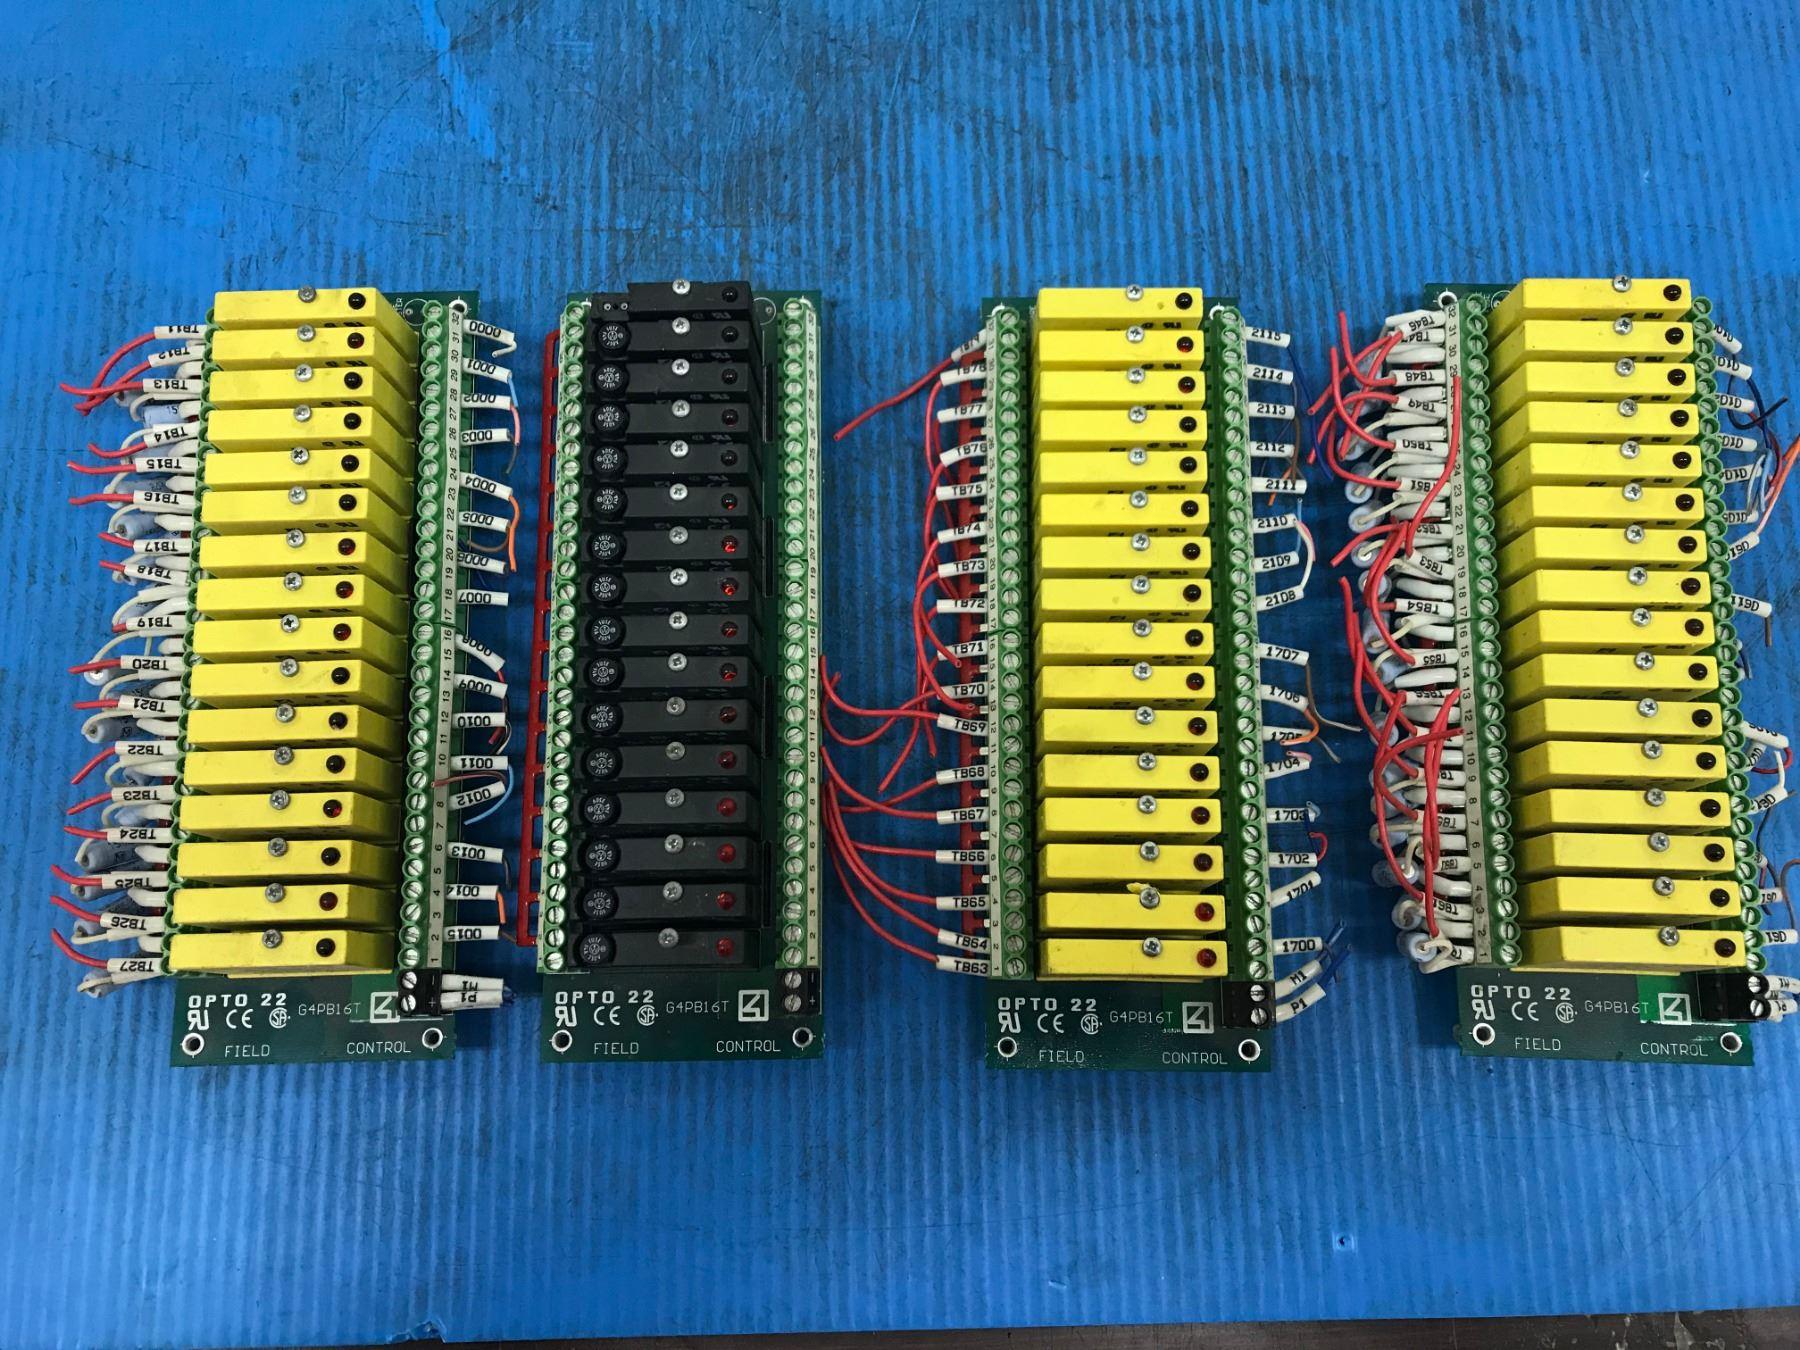 Opto 22 G4PB16T Field Control Module Board Mounting Rack W Input //Output Module